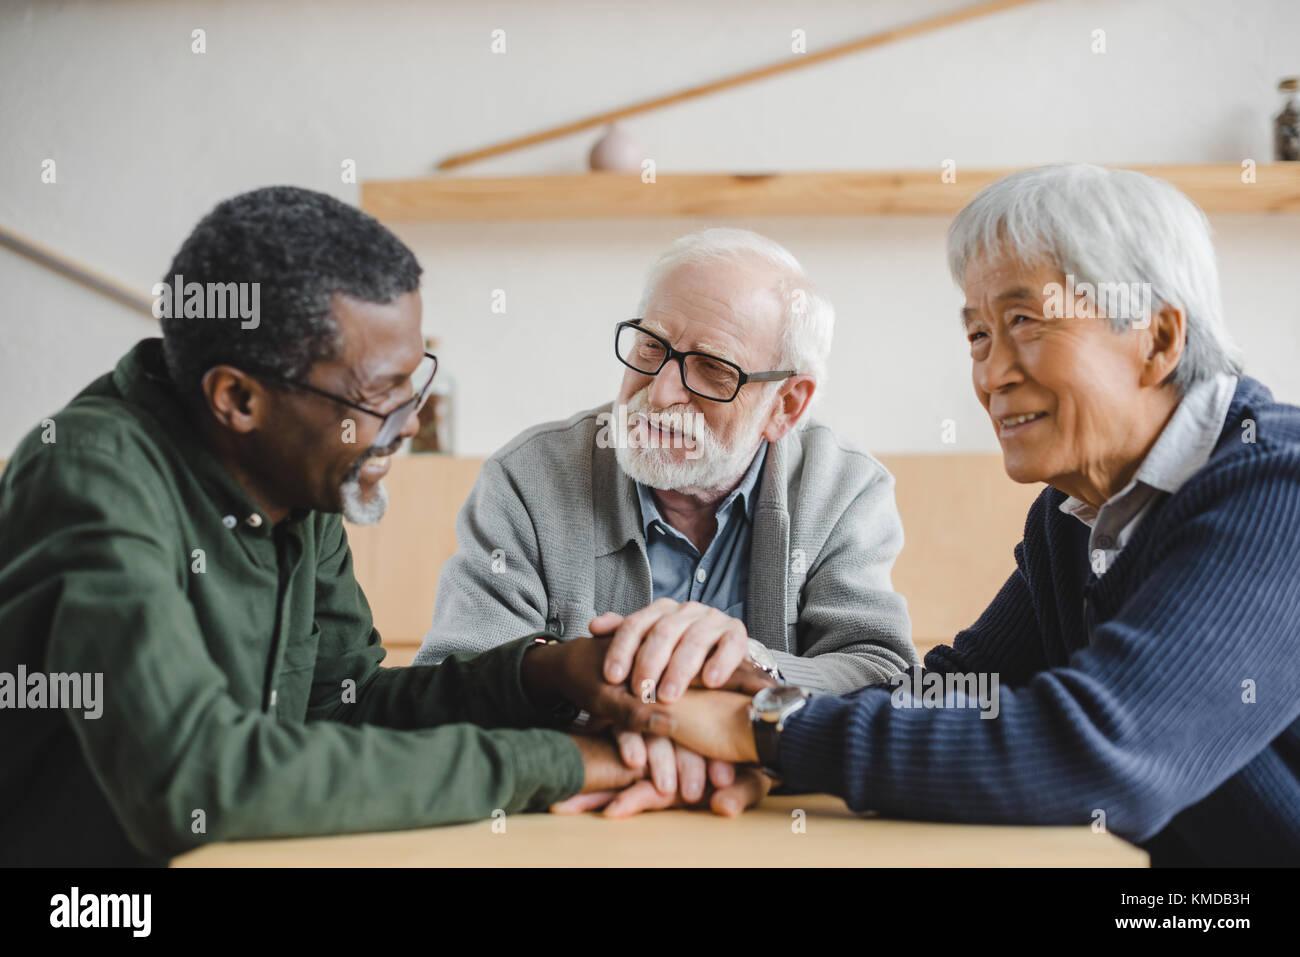 senior friends making team gesture - Stock Image